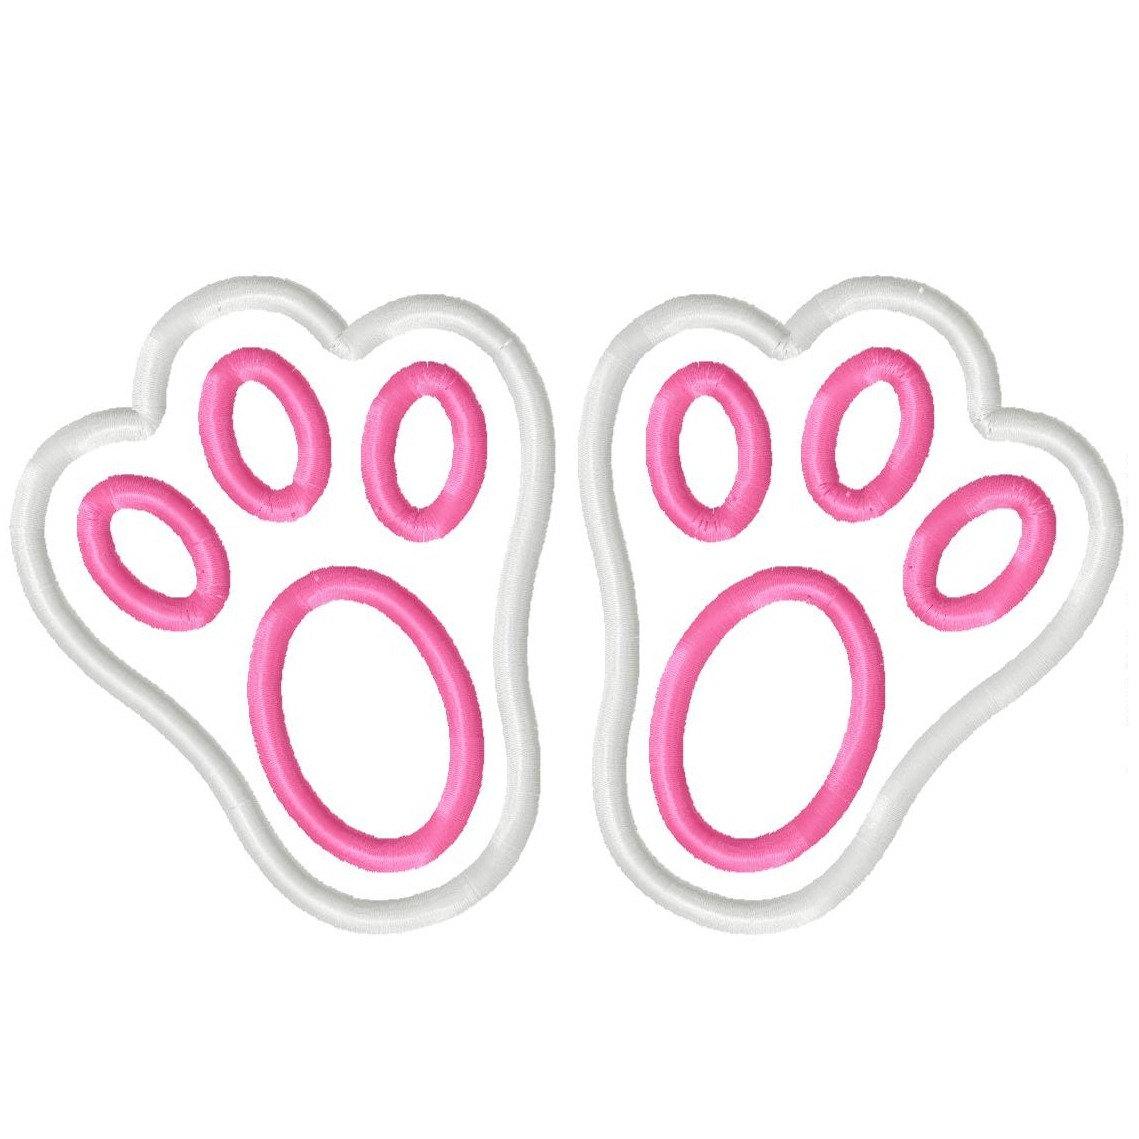 Bunny Feet Silhouette.